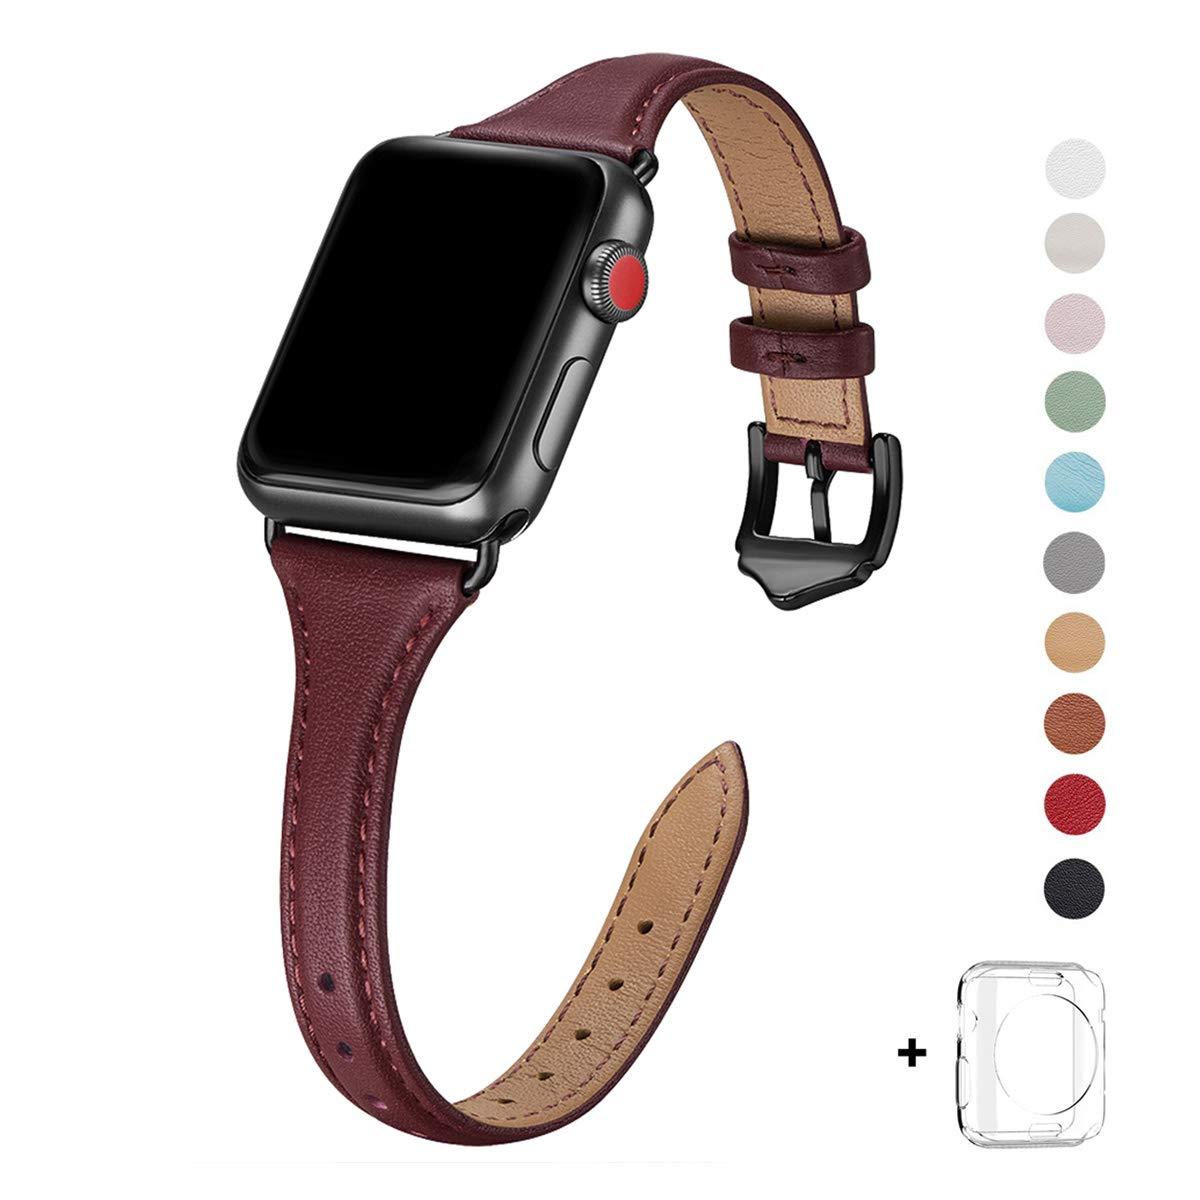 Malla Cuero para Apple Watch (42/44mm) WFEAGL [7W64ZYQX]